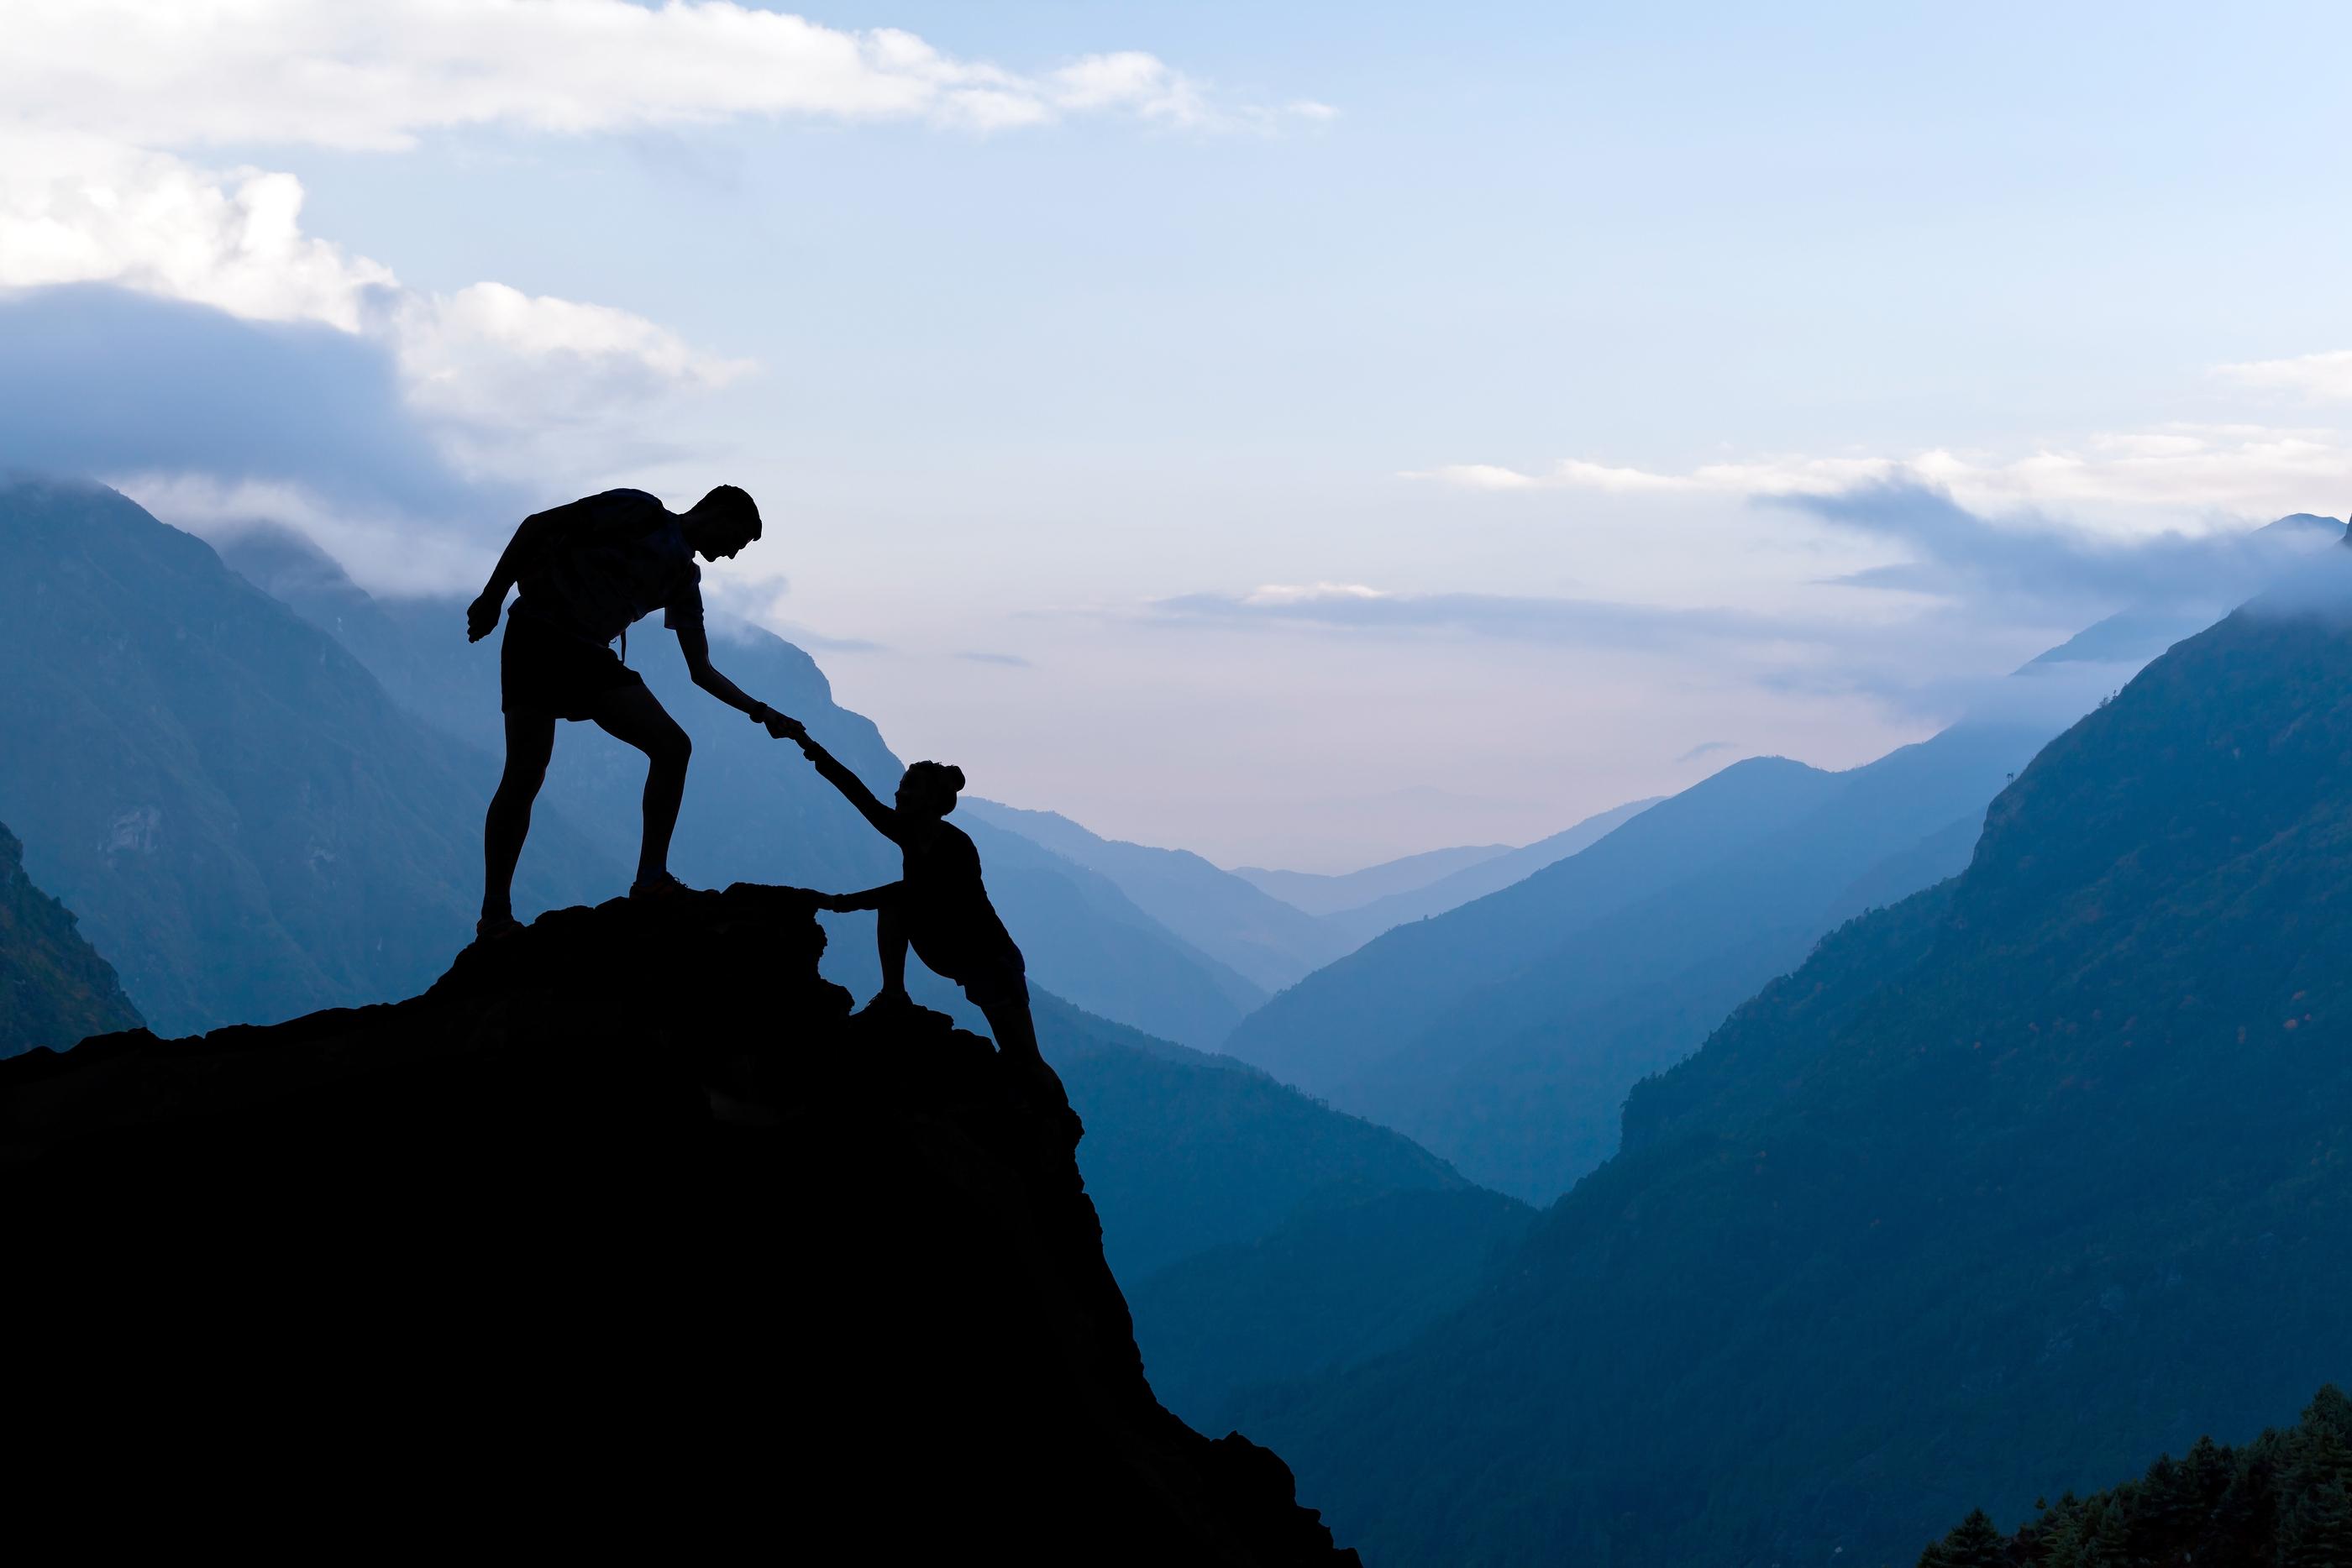 bigstock-Teamwork-Couple-Climbing-Helpi-